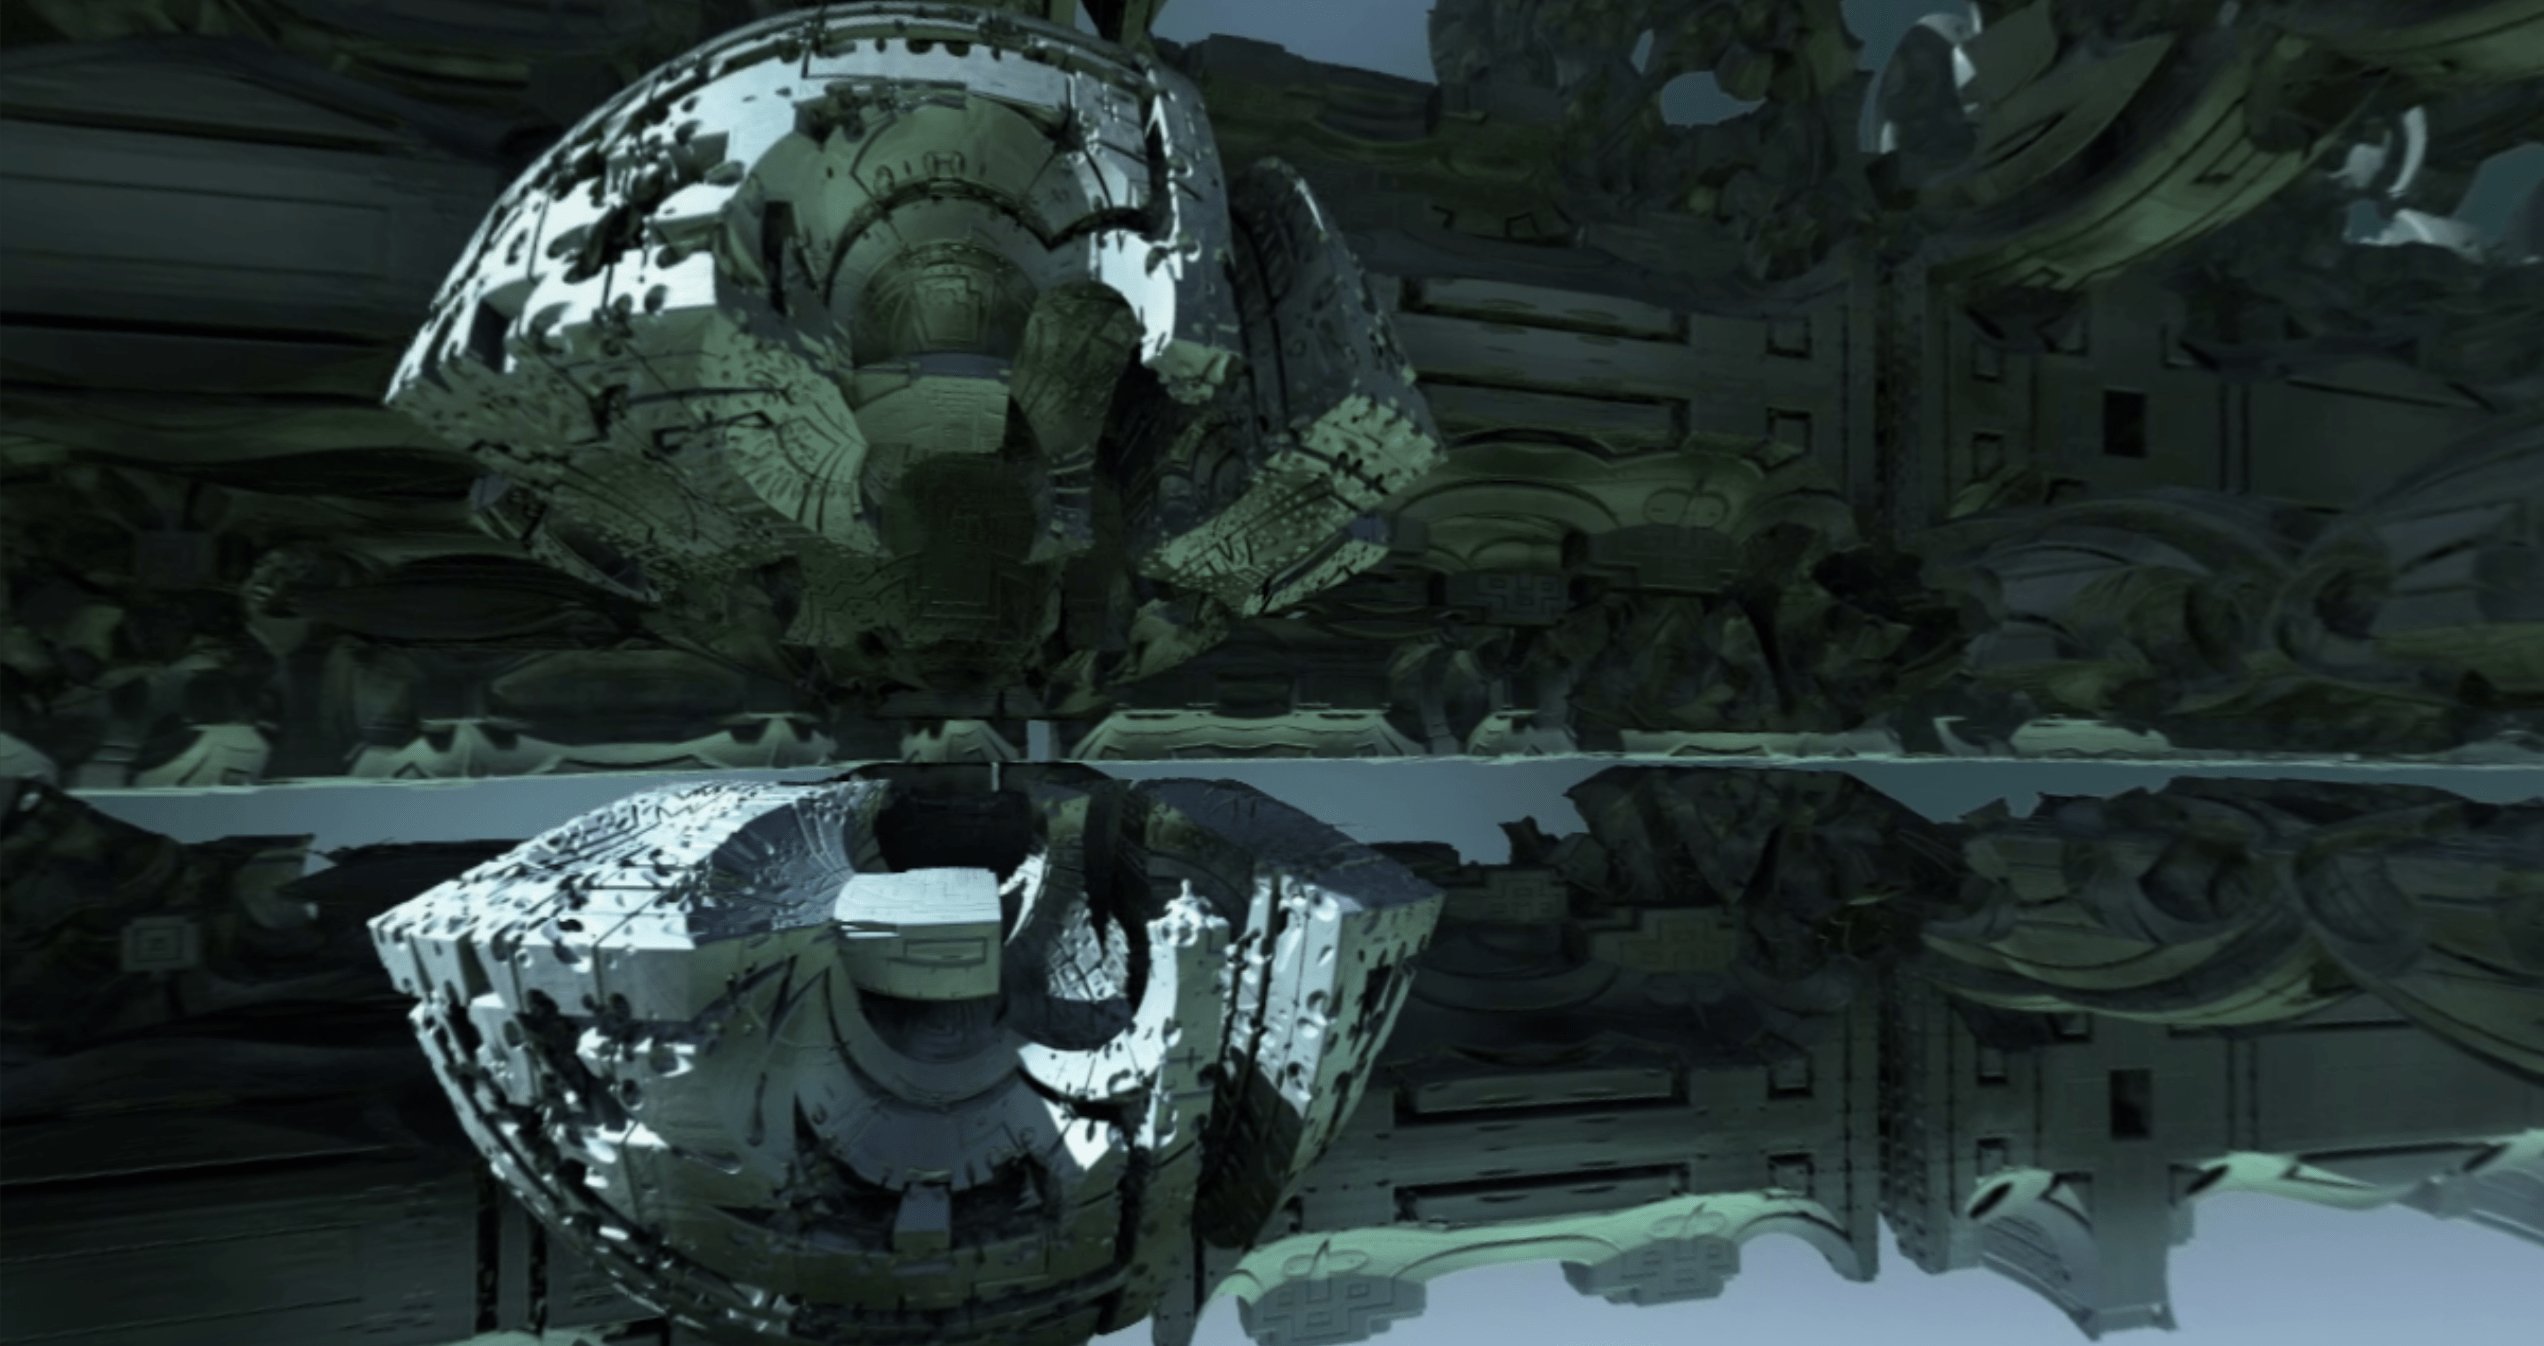 Julius Horsthuis Fractasia VR Project Screenshot 02